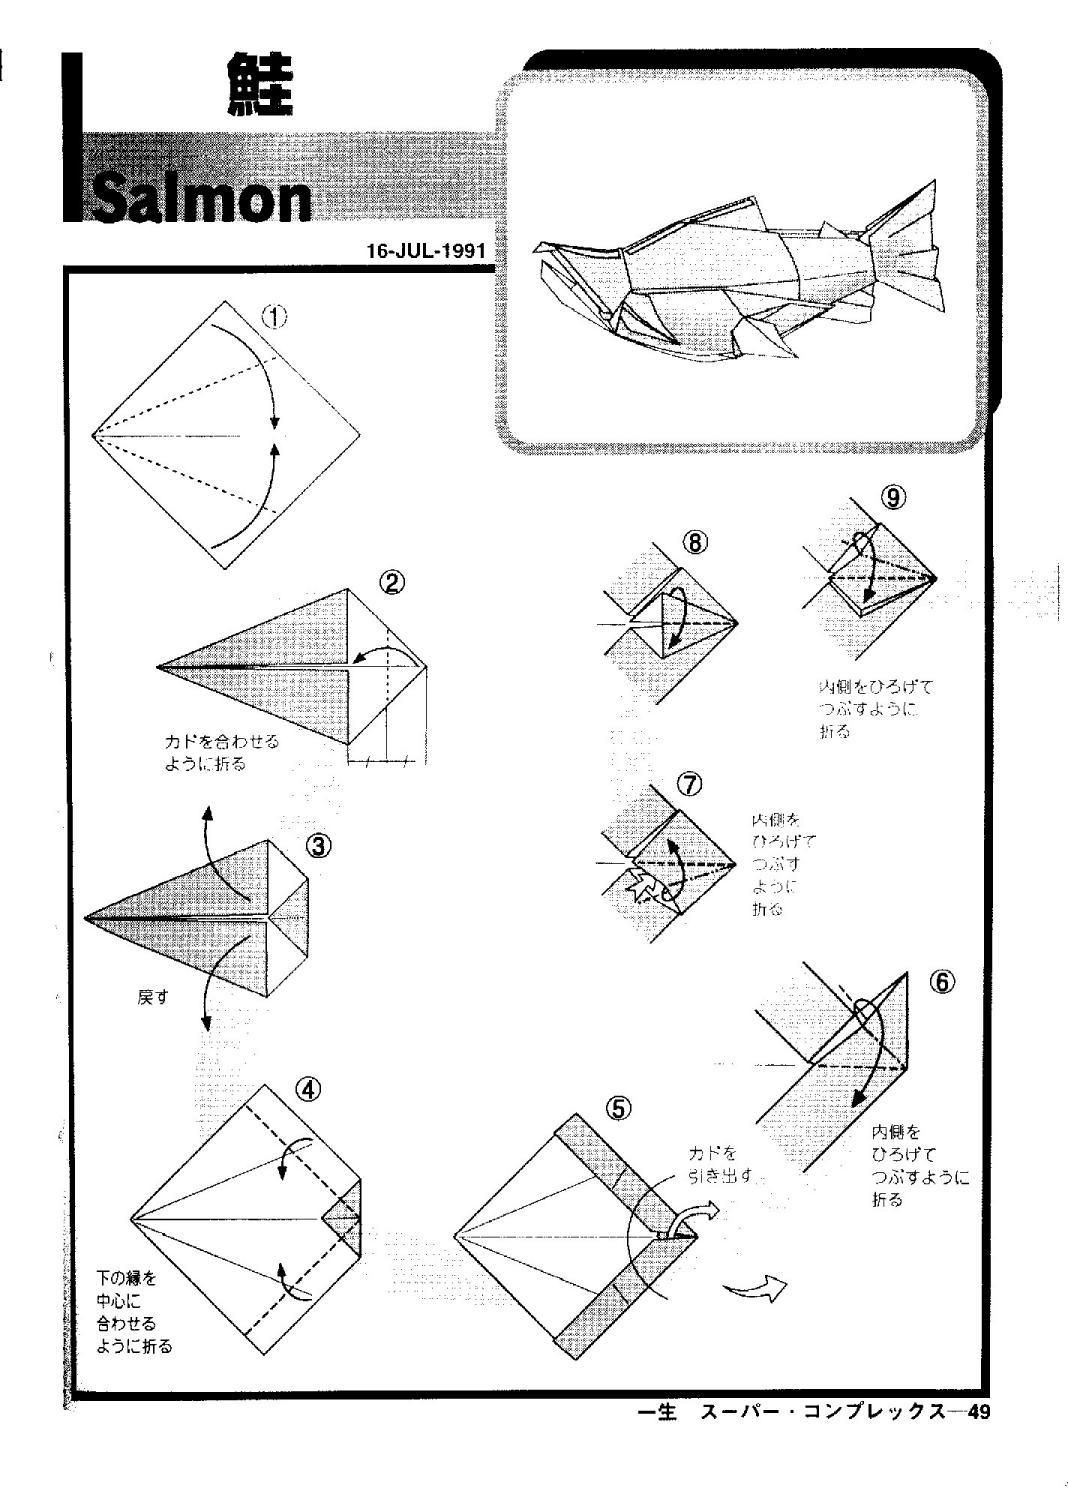 Origami Salmon Diagram Wiring Will Be A Thing Dayton Relay 1 5yr13n Super Complex Yoshino Issei Animals Pinterest Rh Com Body Parts